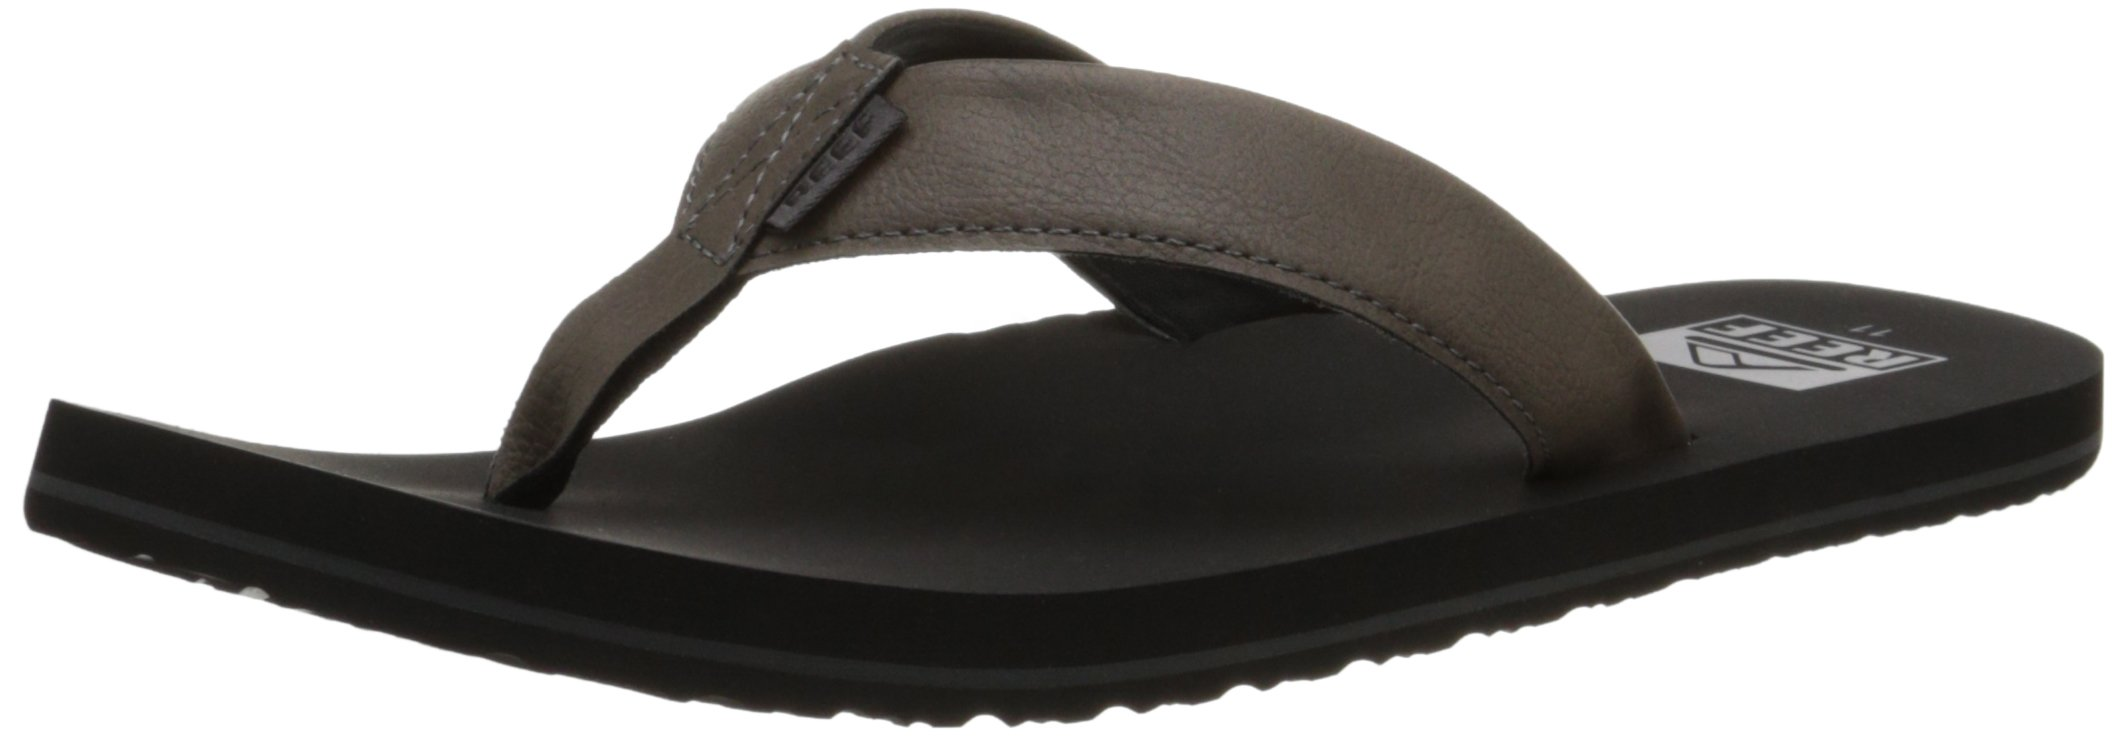 Reef Men's Twinpin Sandal, Grey, 11 M US